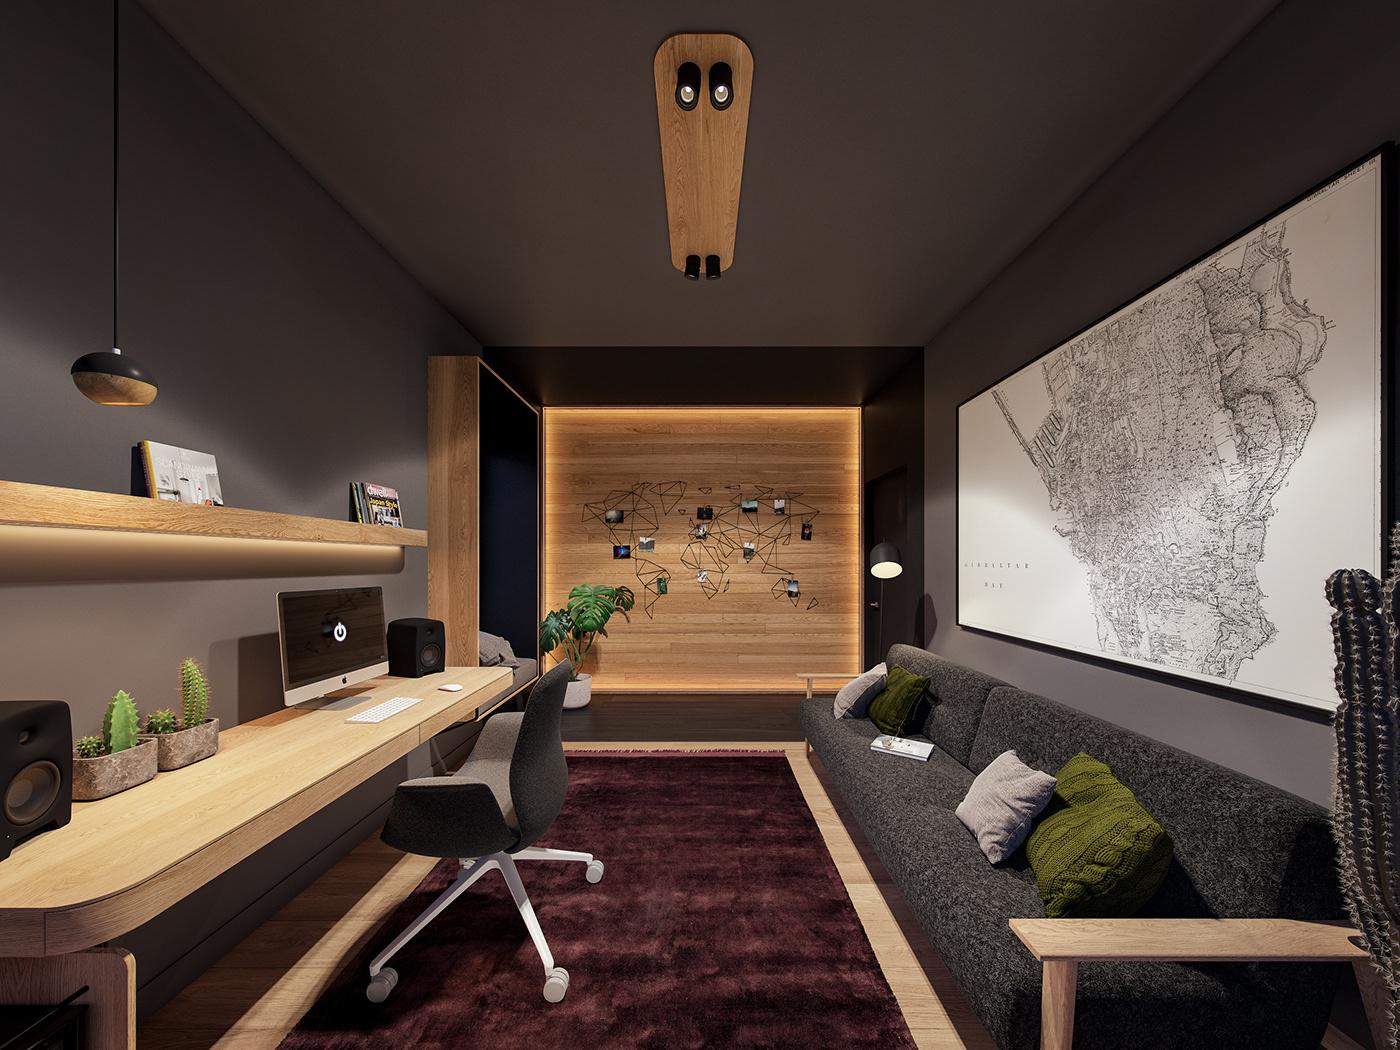 concrete cosy desin house Interior minimal modern pin Plum wood